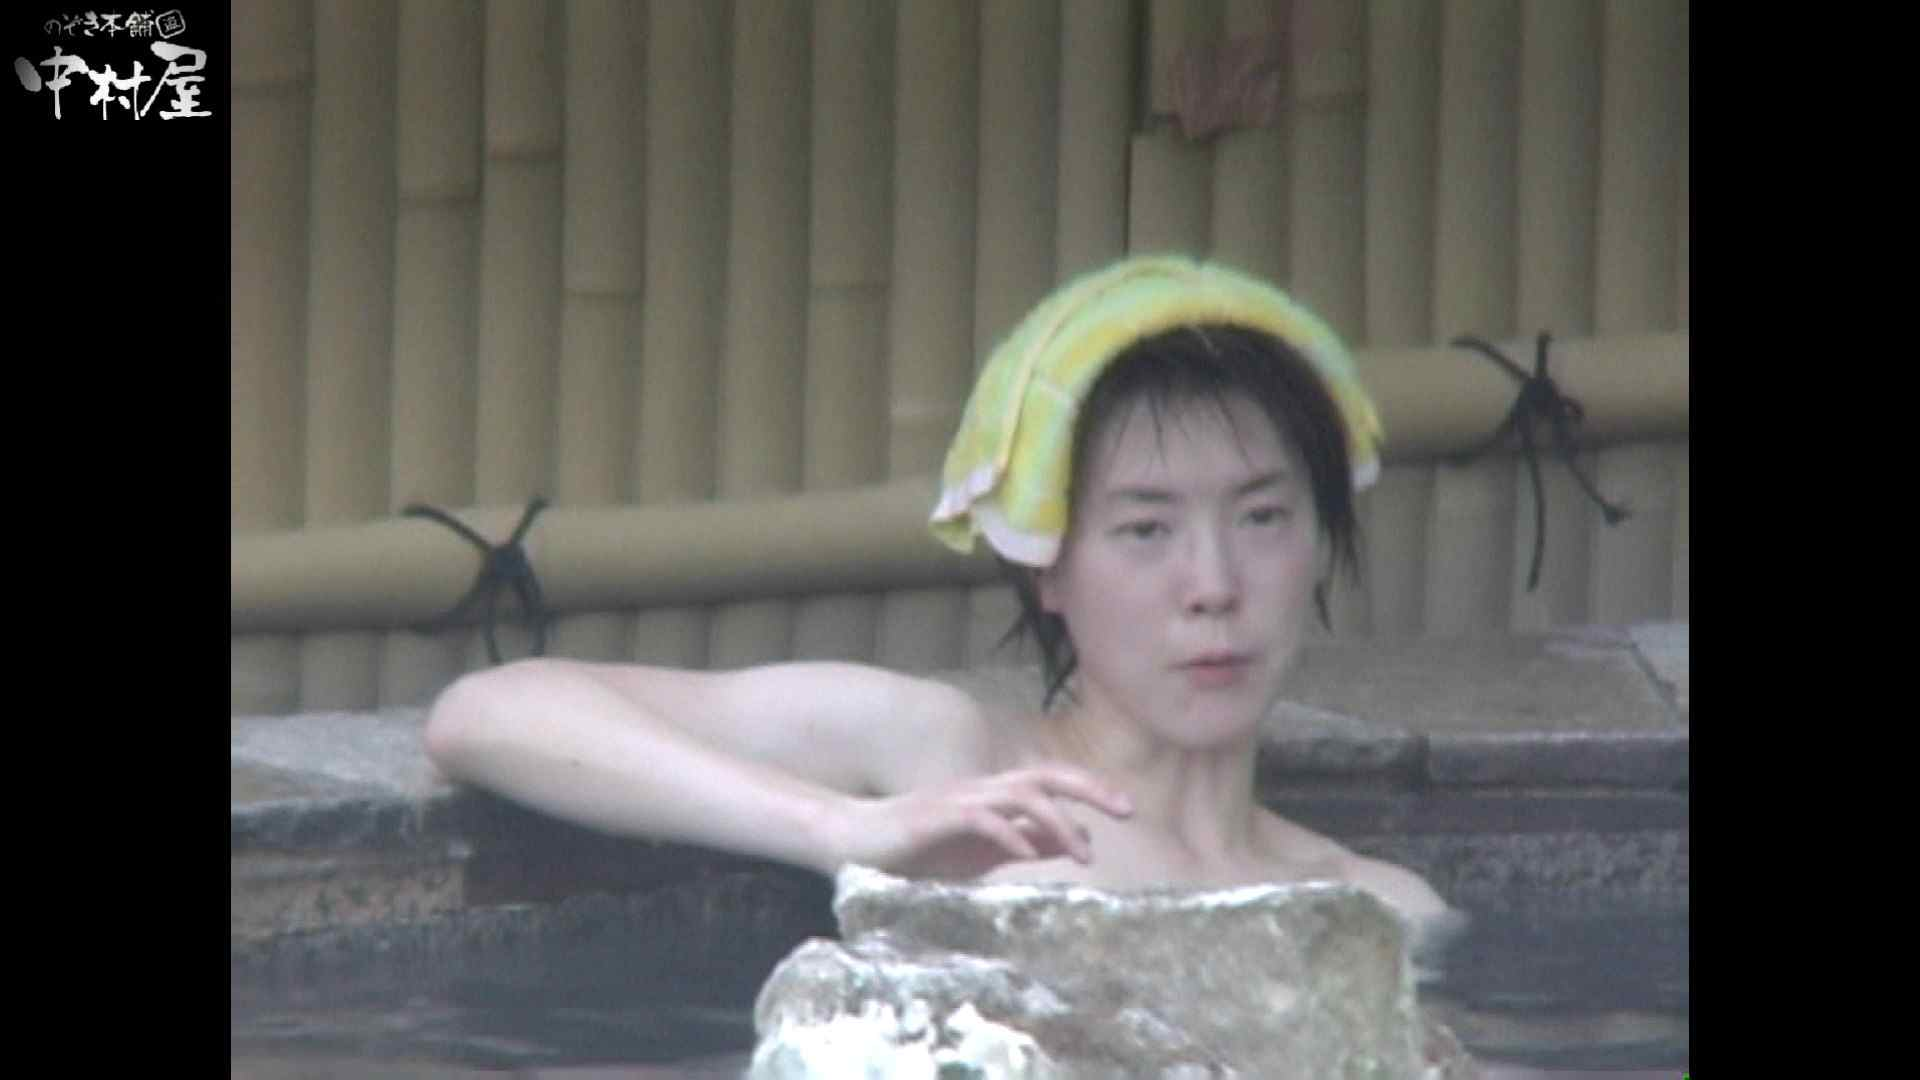 Aquaな露天風呂Vol.938 0 | エッチな盗撮  111pic 65